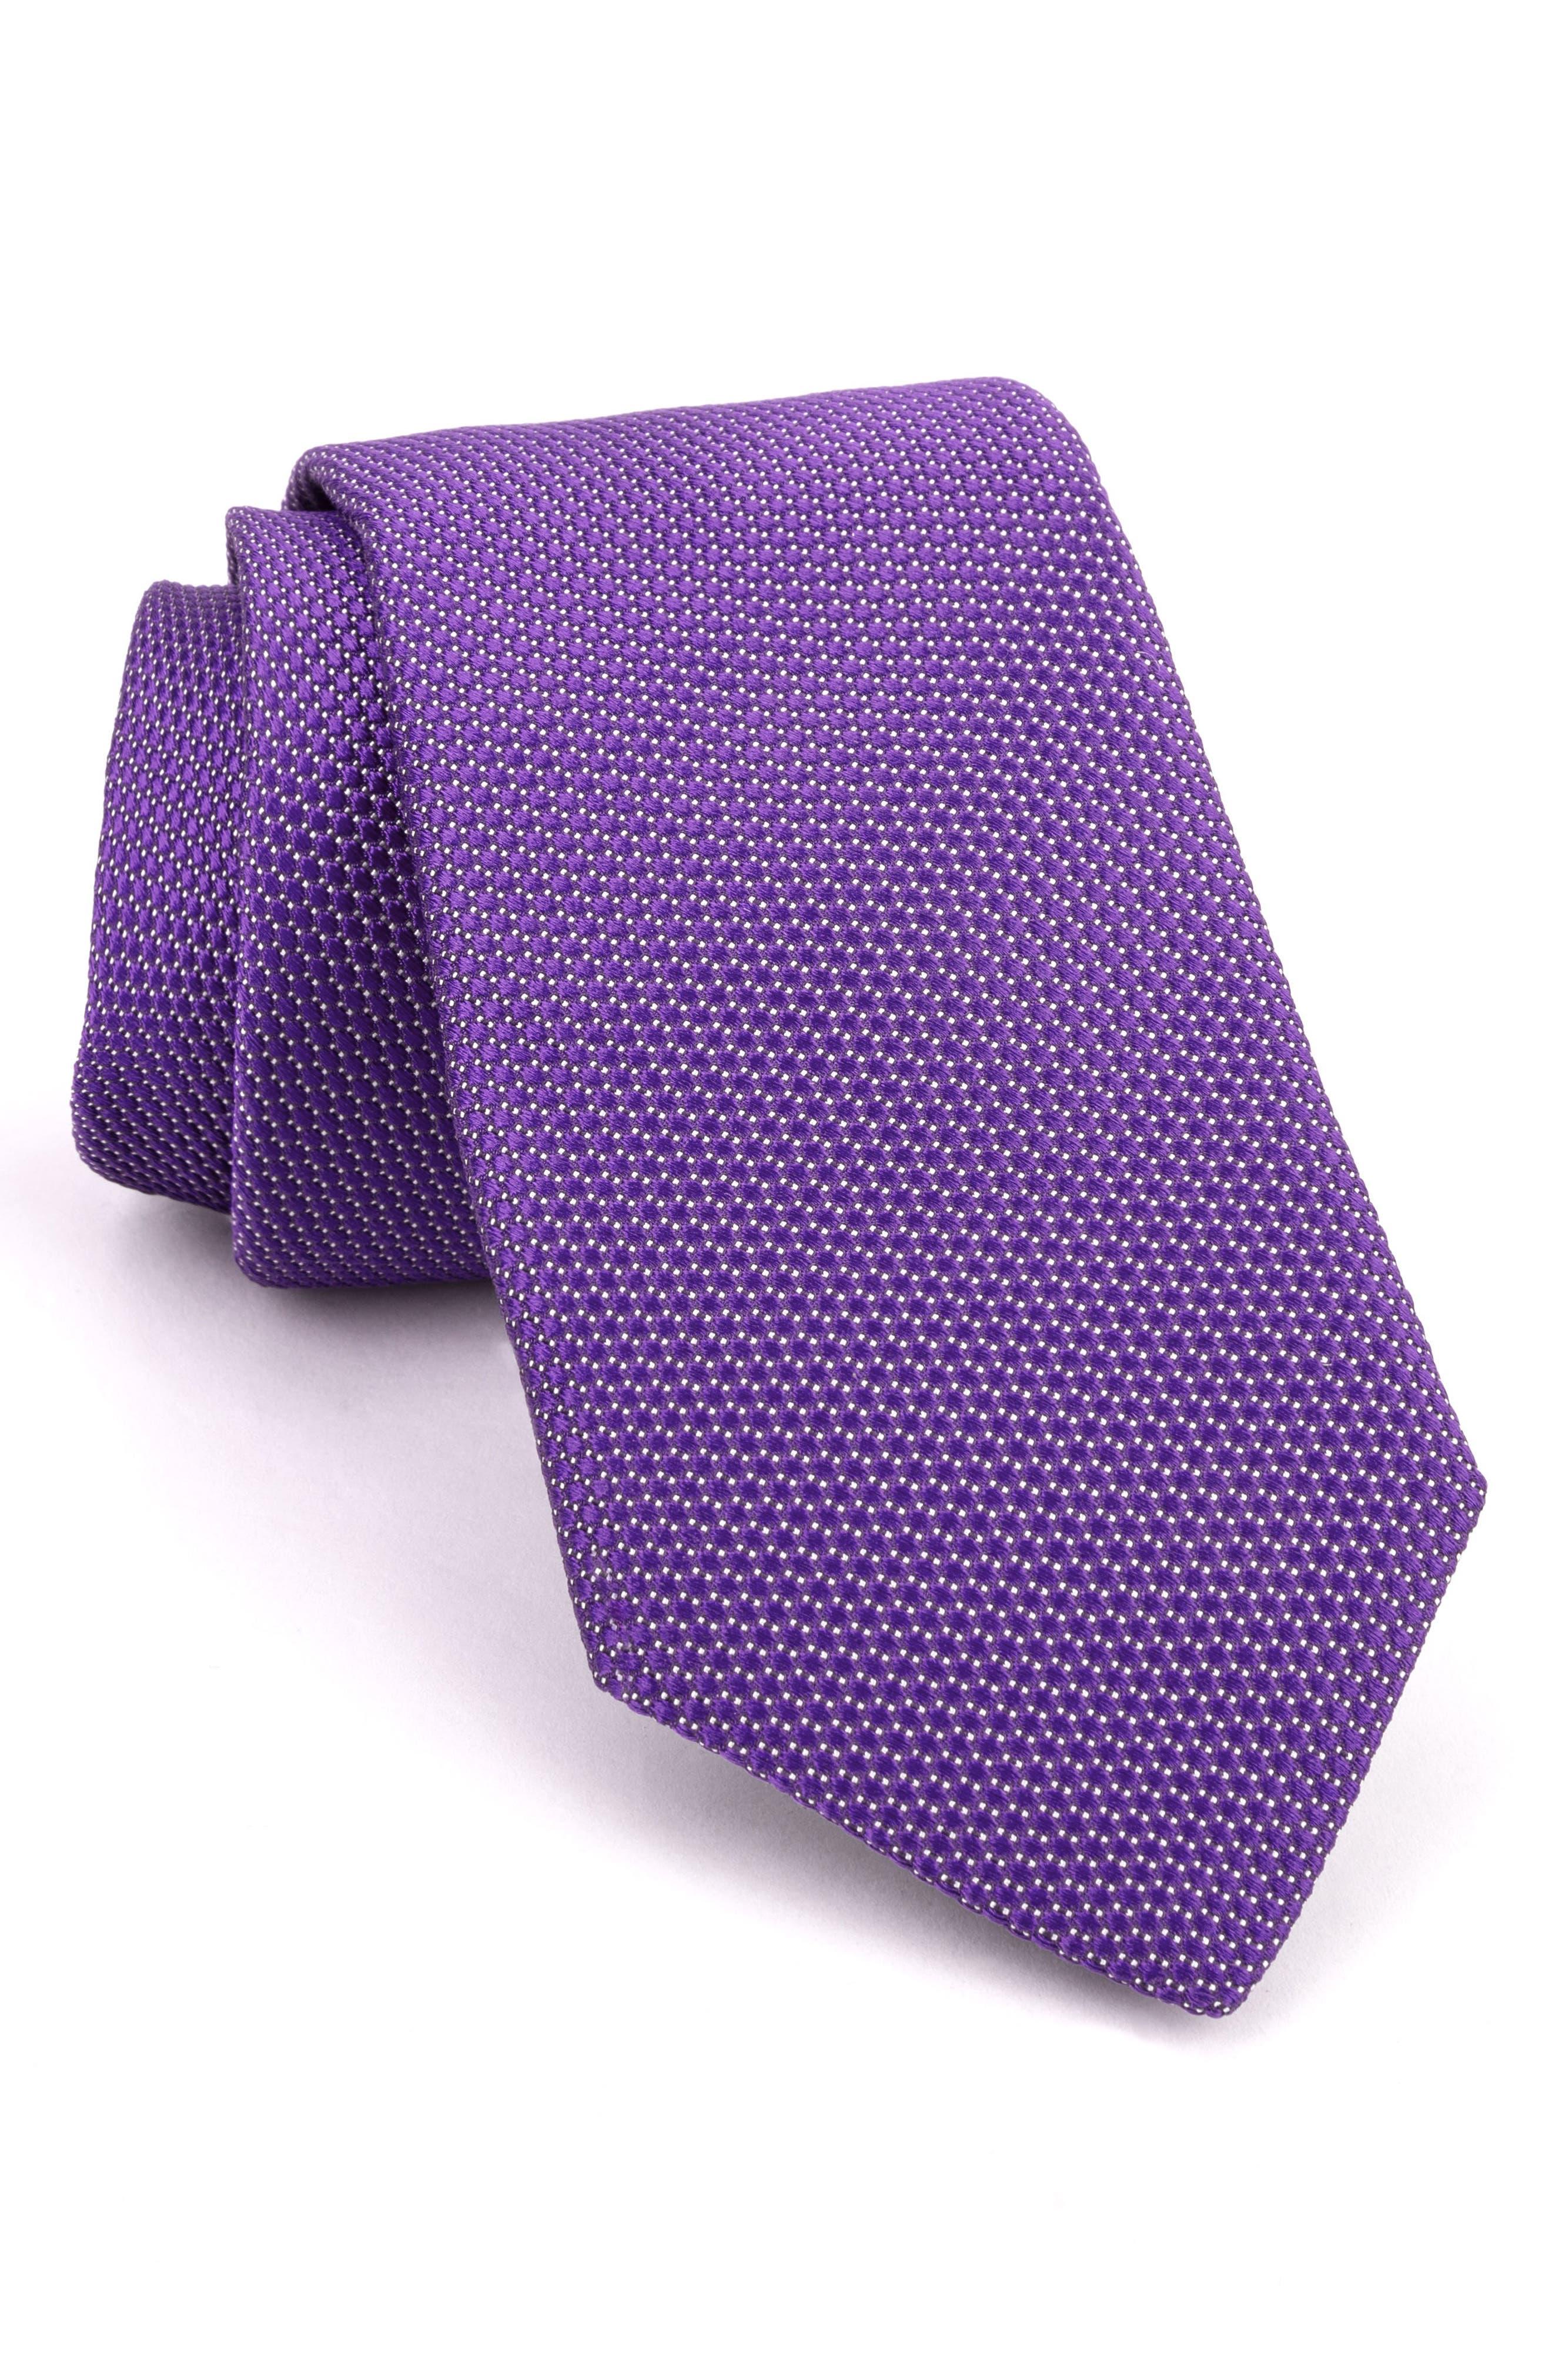 Micro Solid Silk Tie,                             Main thumbnail 1, color,                             Purple